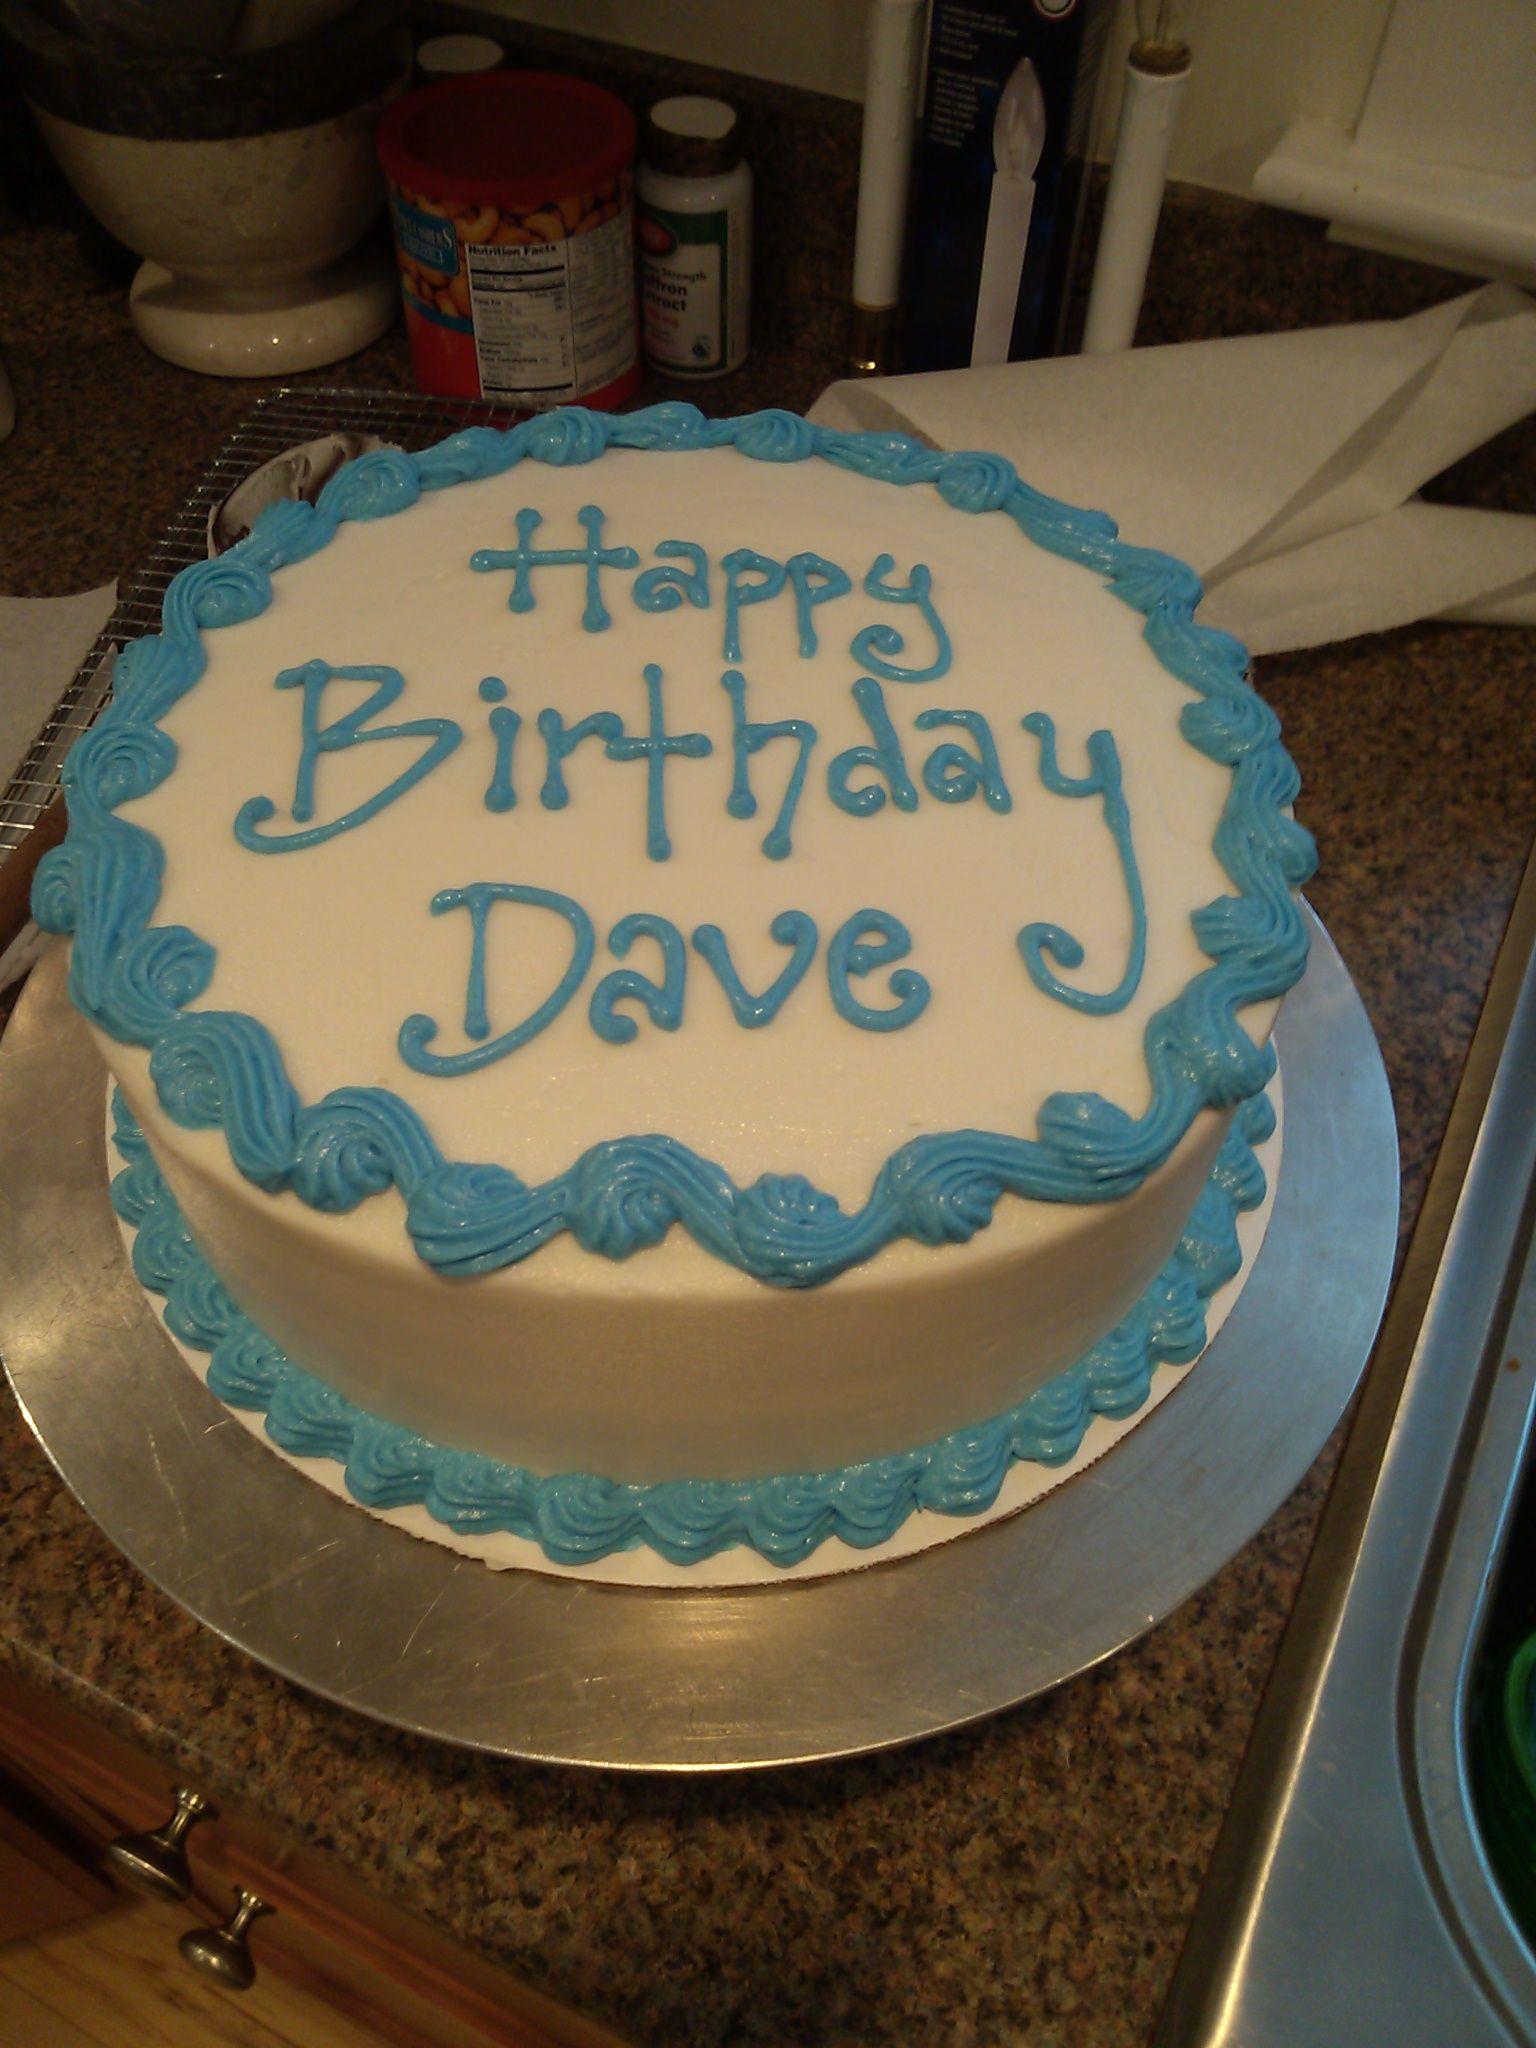 Astounding Happy Birthday Cake Writing With Images Happy Birthday Cakes Personalised Birthday Cards Fashionlily Jamesorg